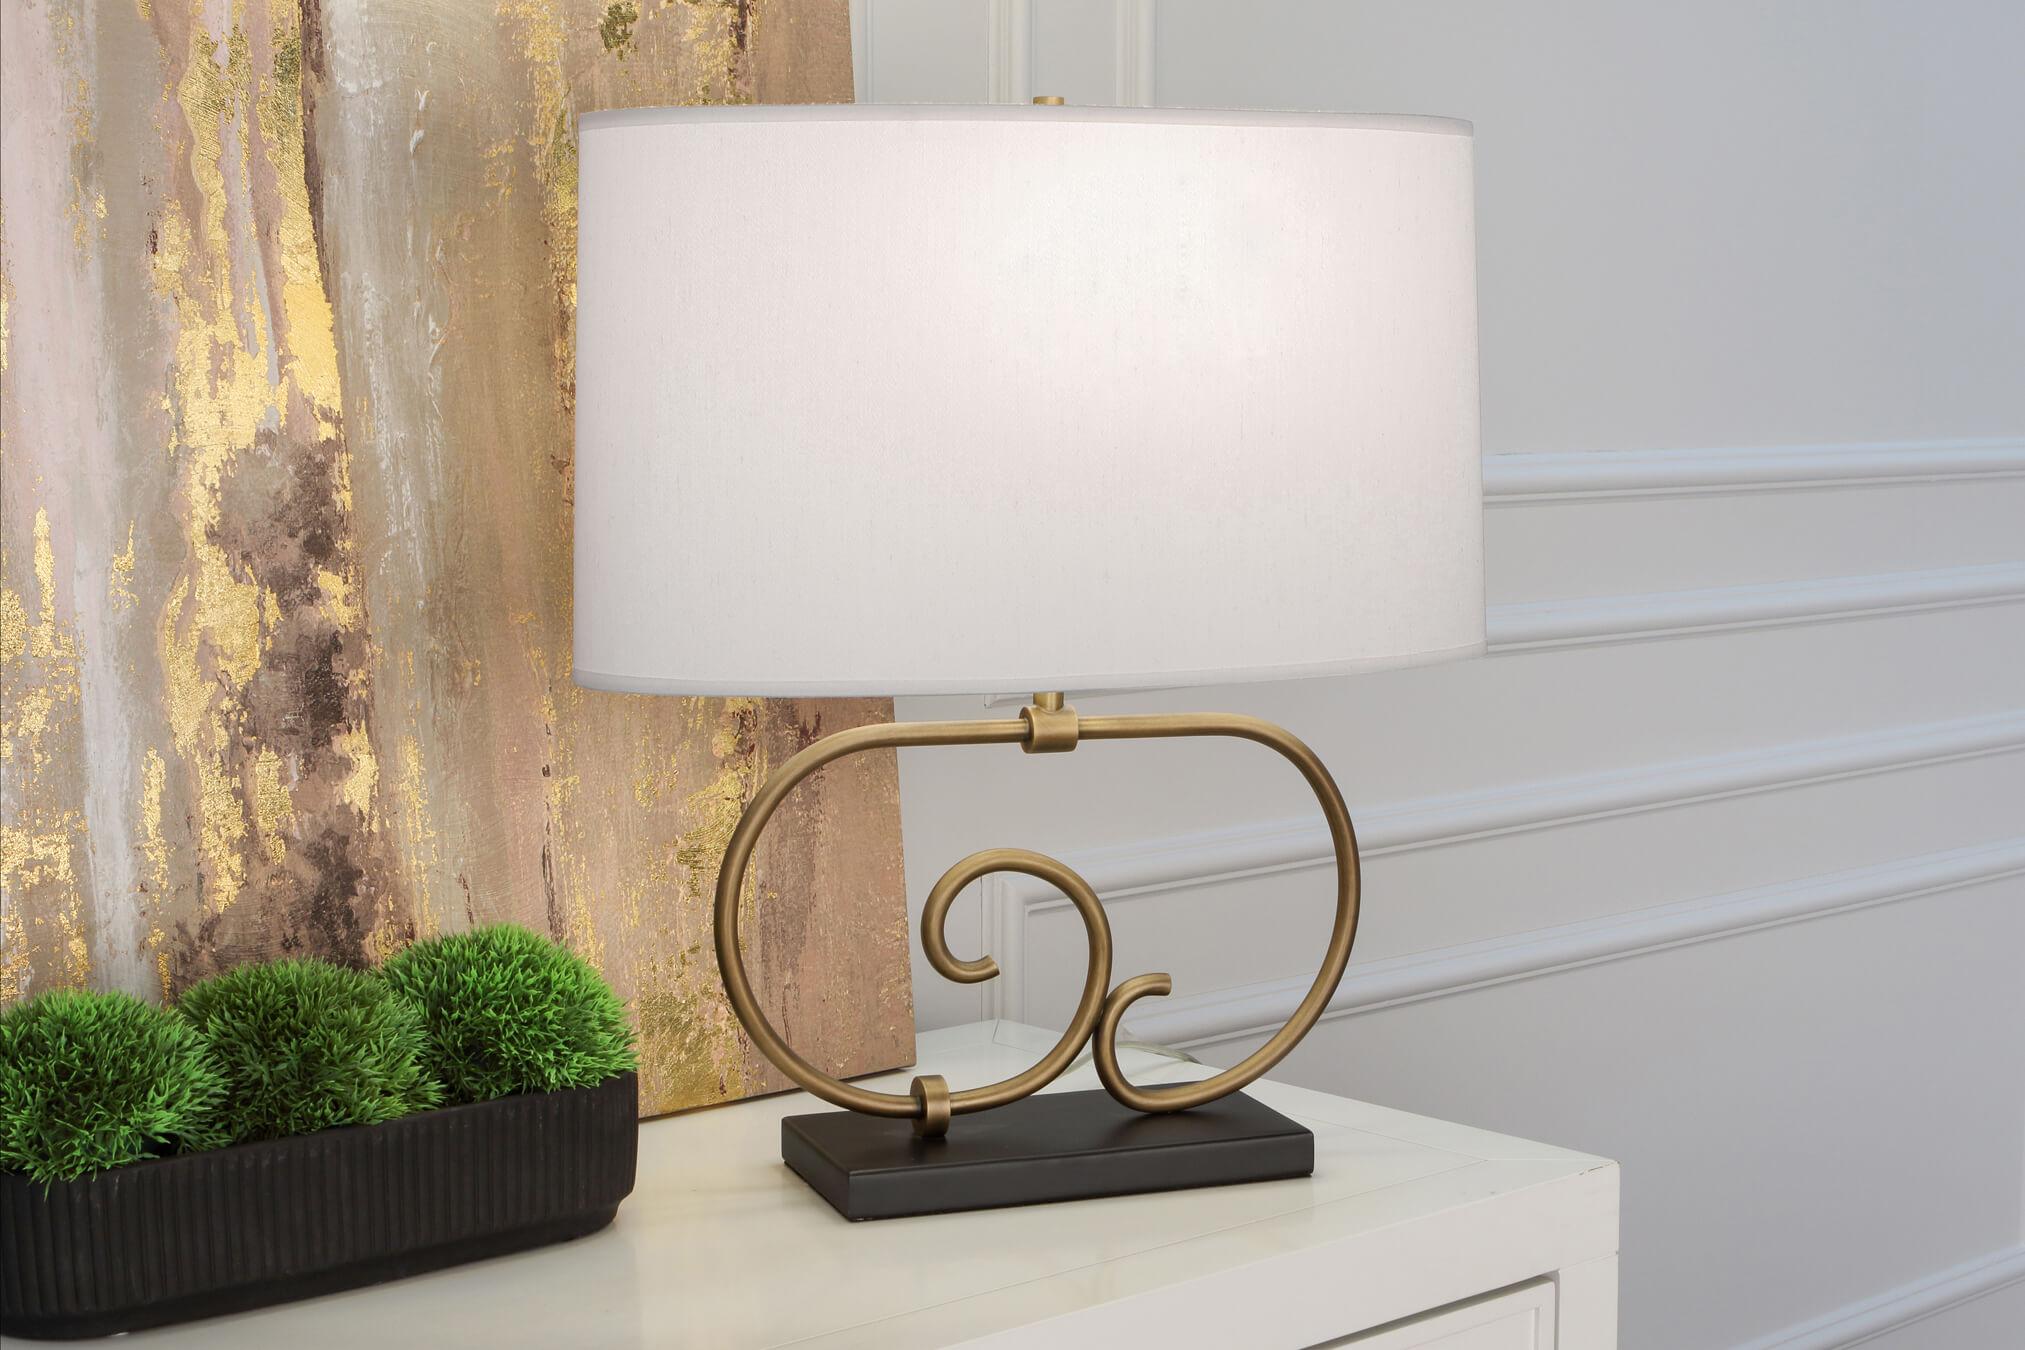 CHLOE TABLE LAMP by Robert Abbey